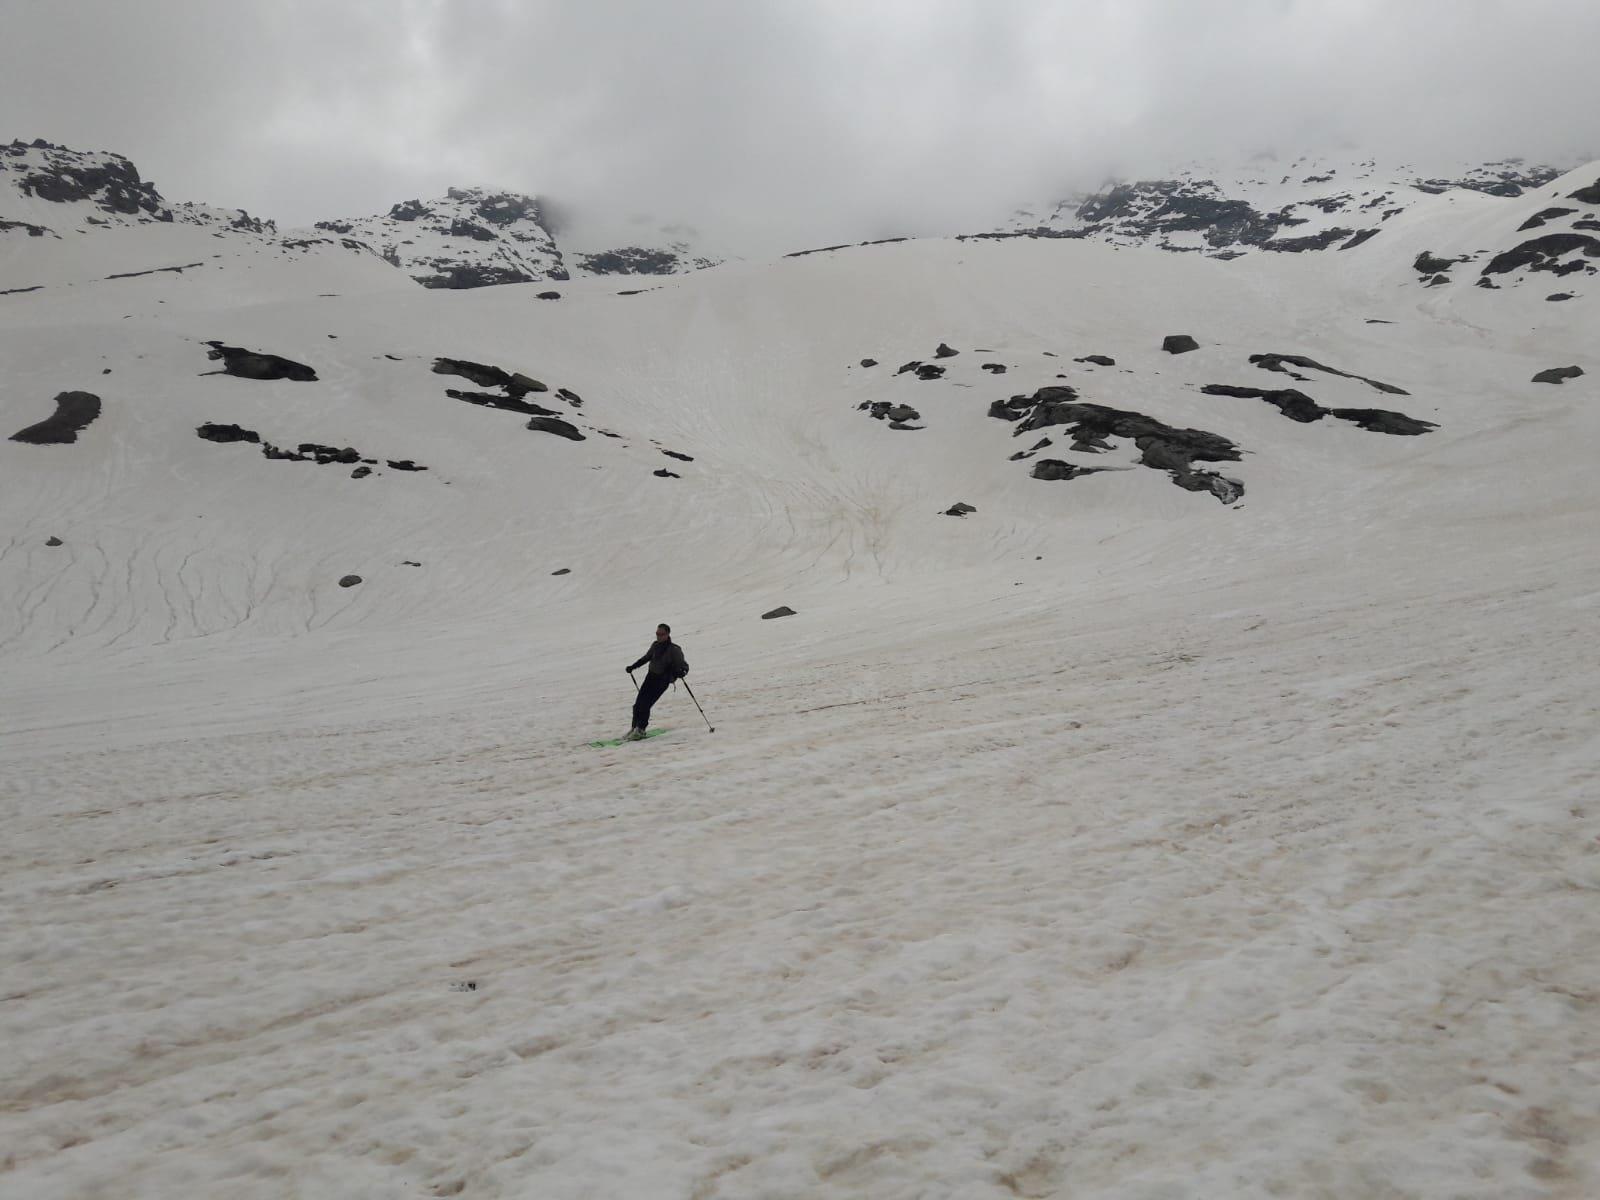 Neve pesante ma comunque ben sciabile